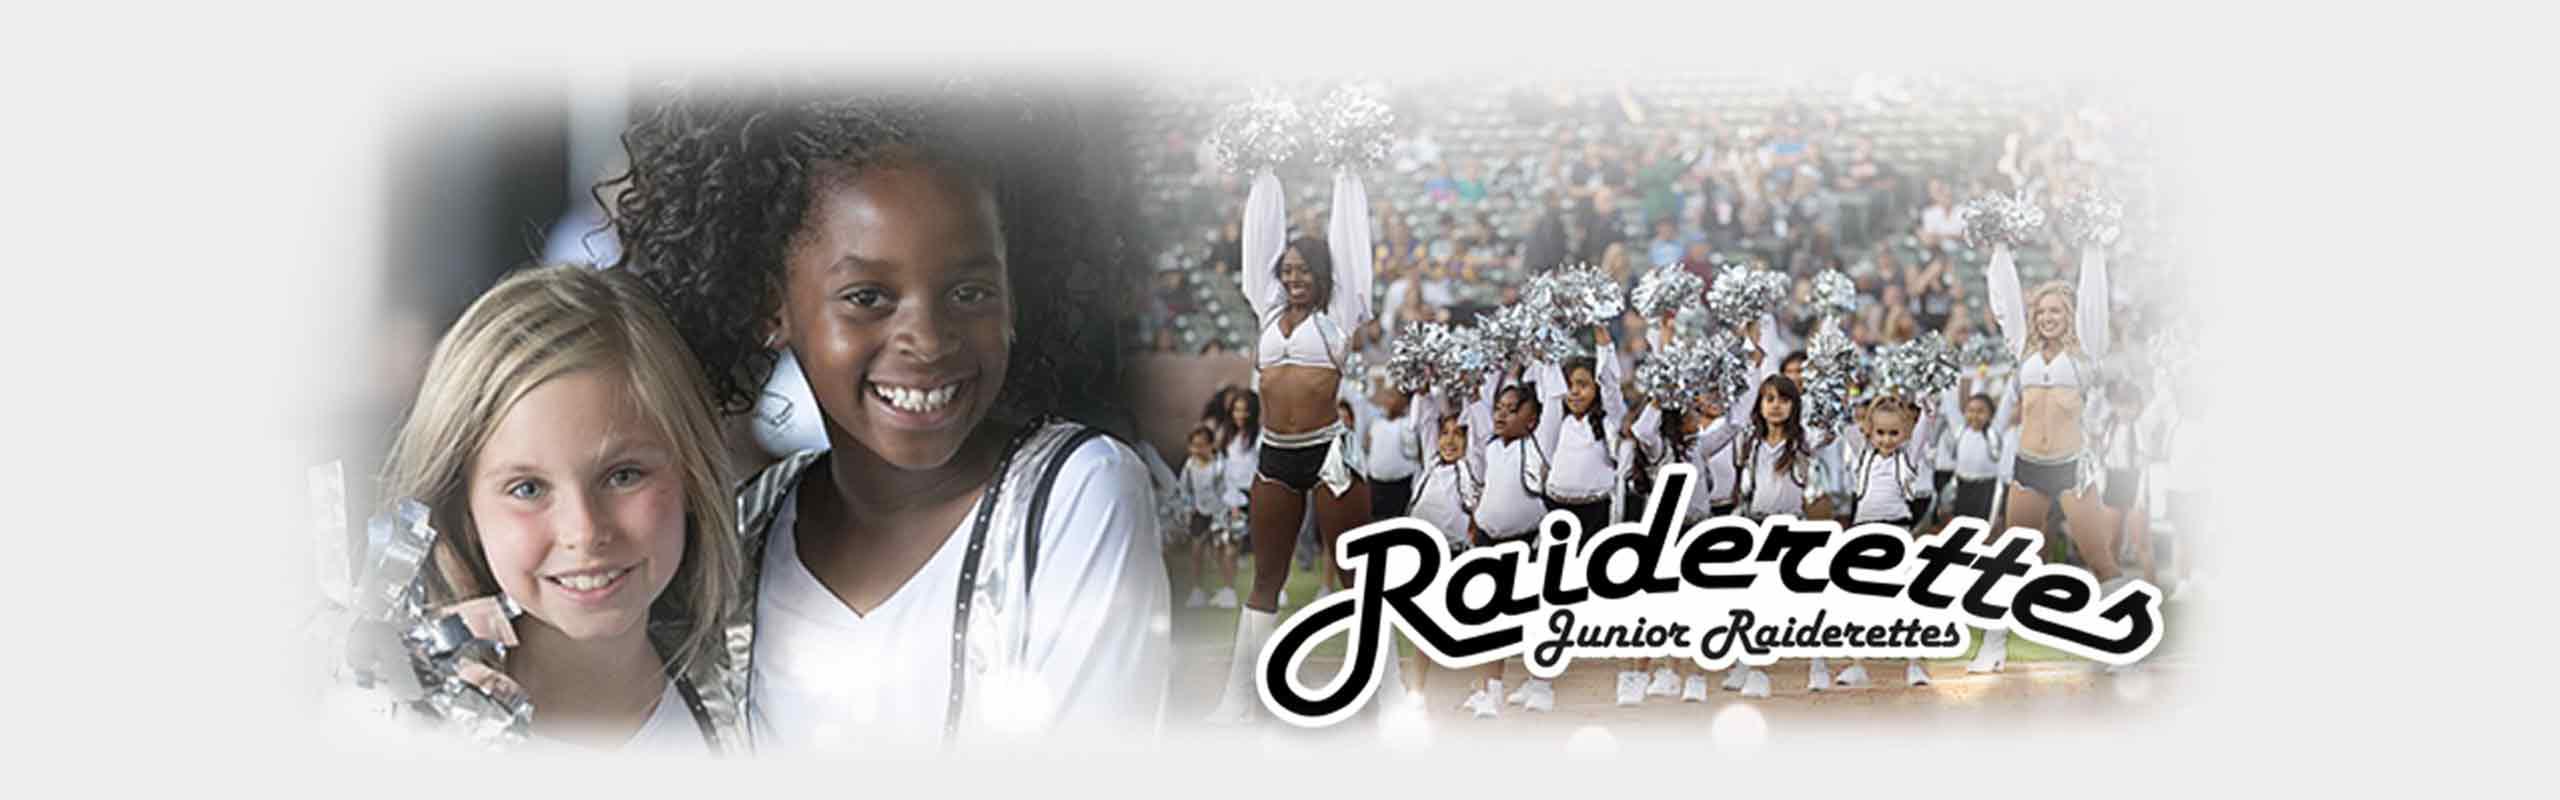 jr-raiderettes-2018